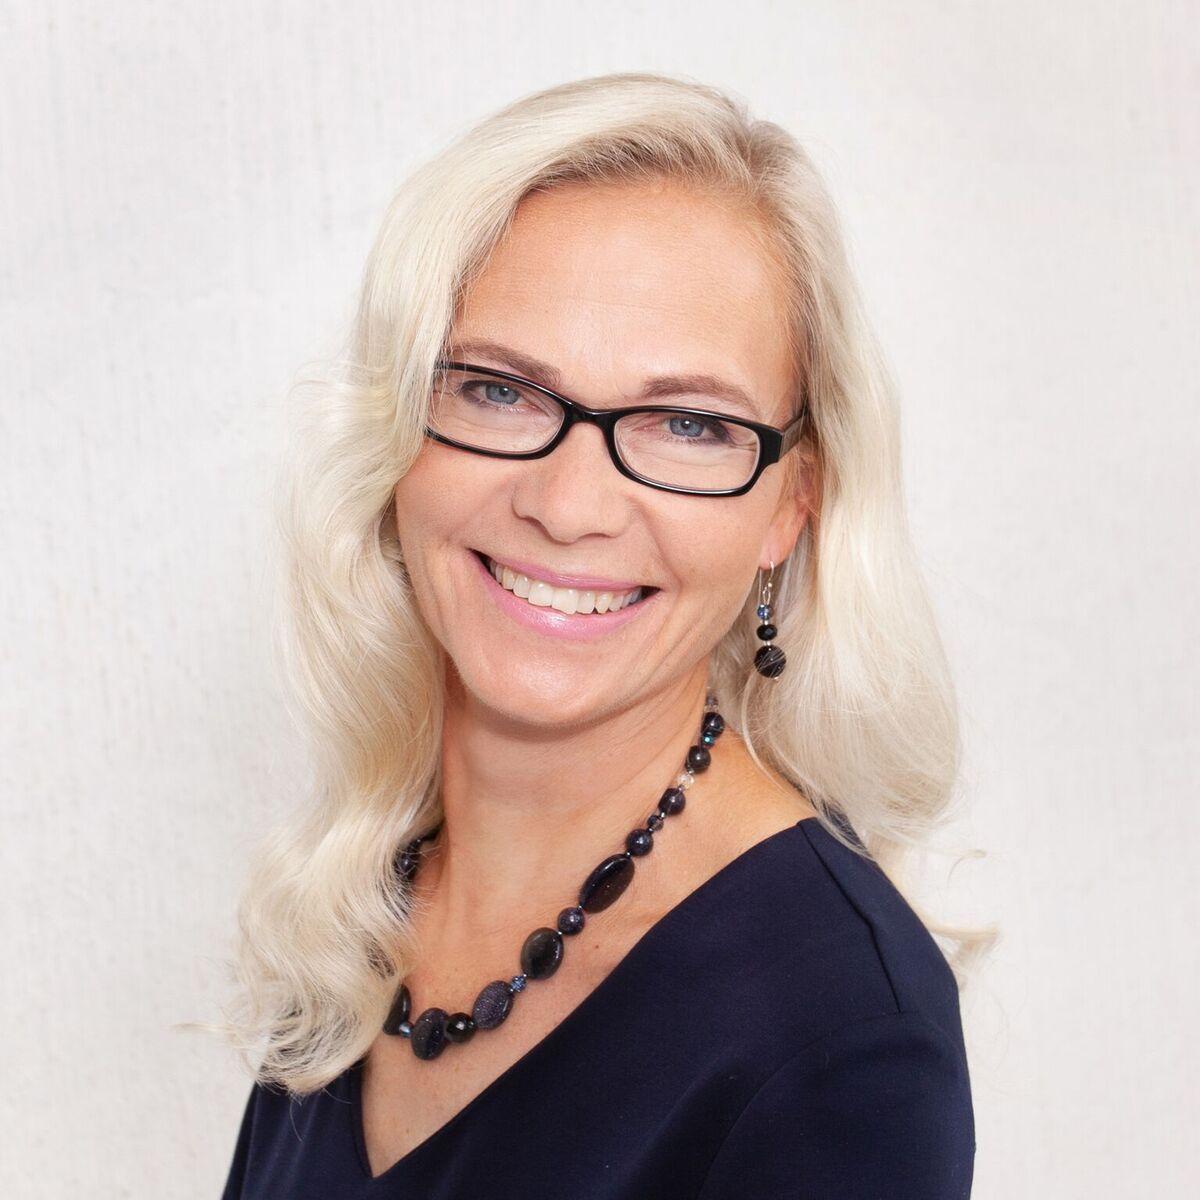 Jaana Villanen, arvostrategi, palvelu- ja liiketoimintavalmentaja, tietokirjailija, sparraaja, puhuja ja #Wgh19 päälavan juontaja.